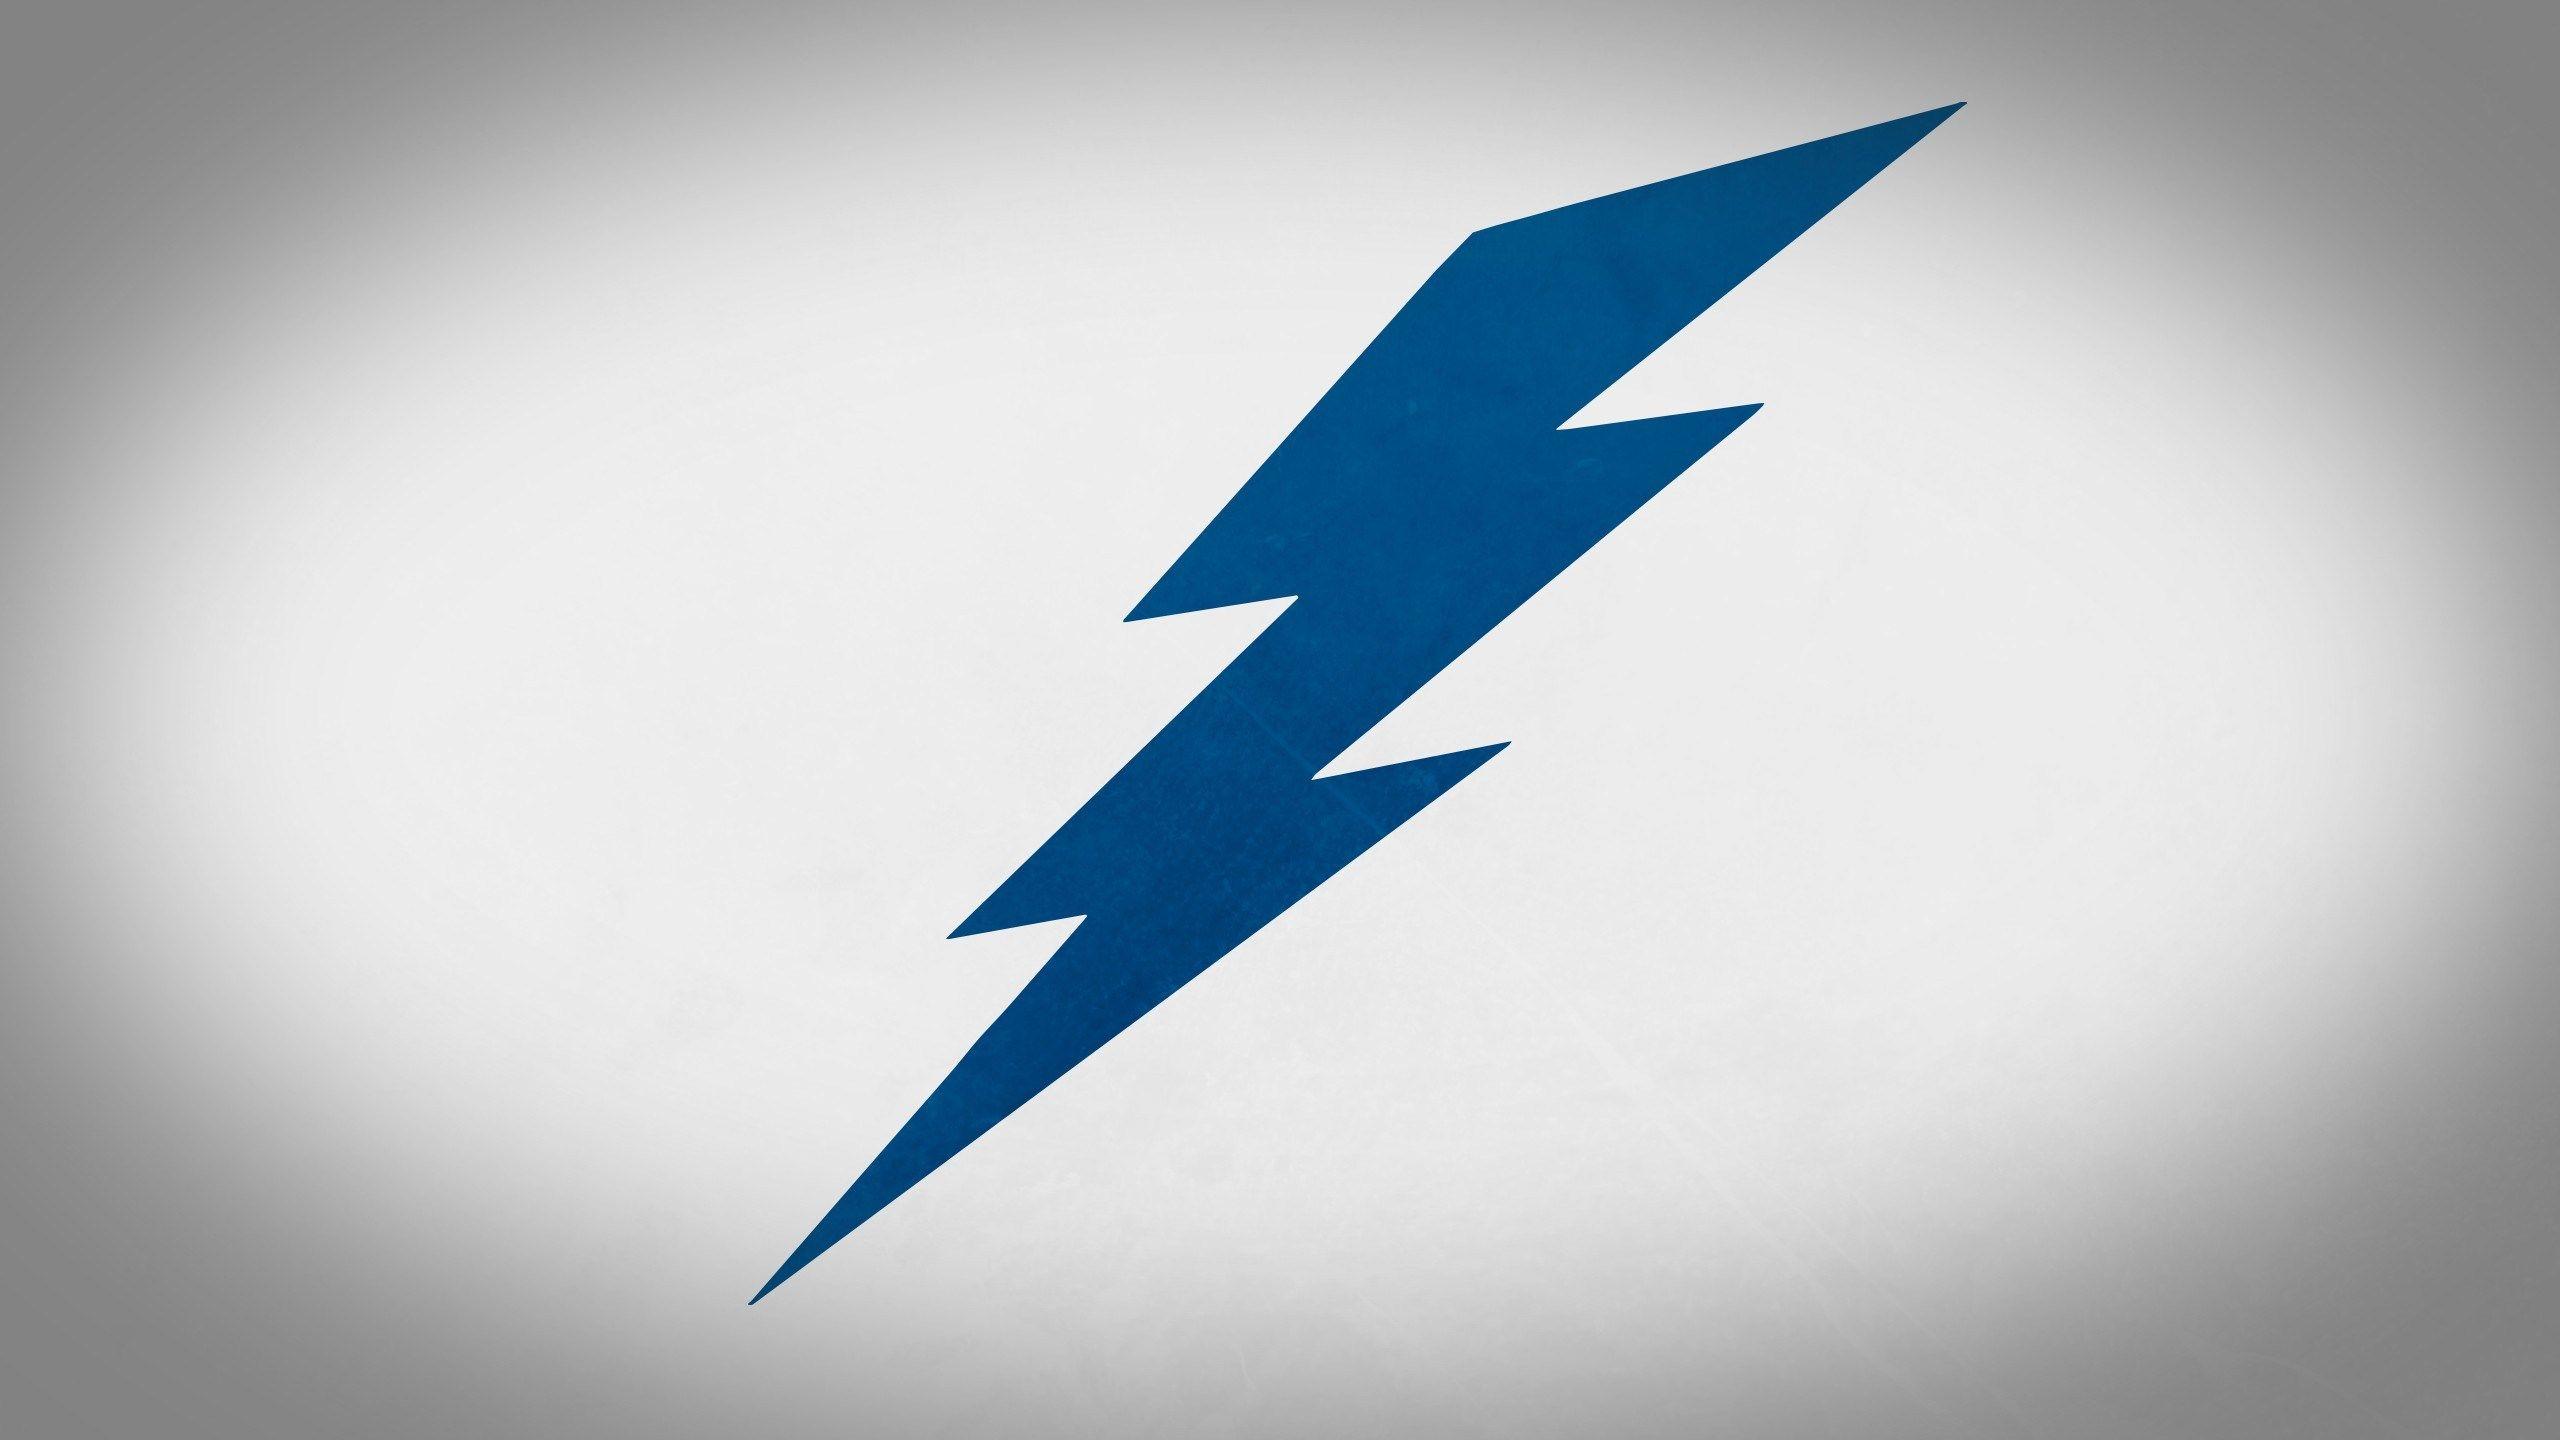 Windows Wallpaper Tampa Bay Lightning Tampa Bay Lightning